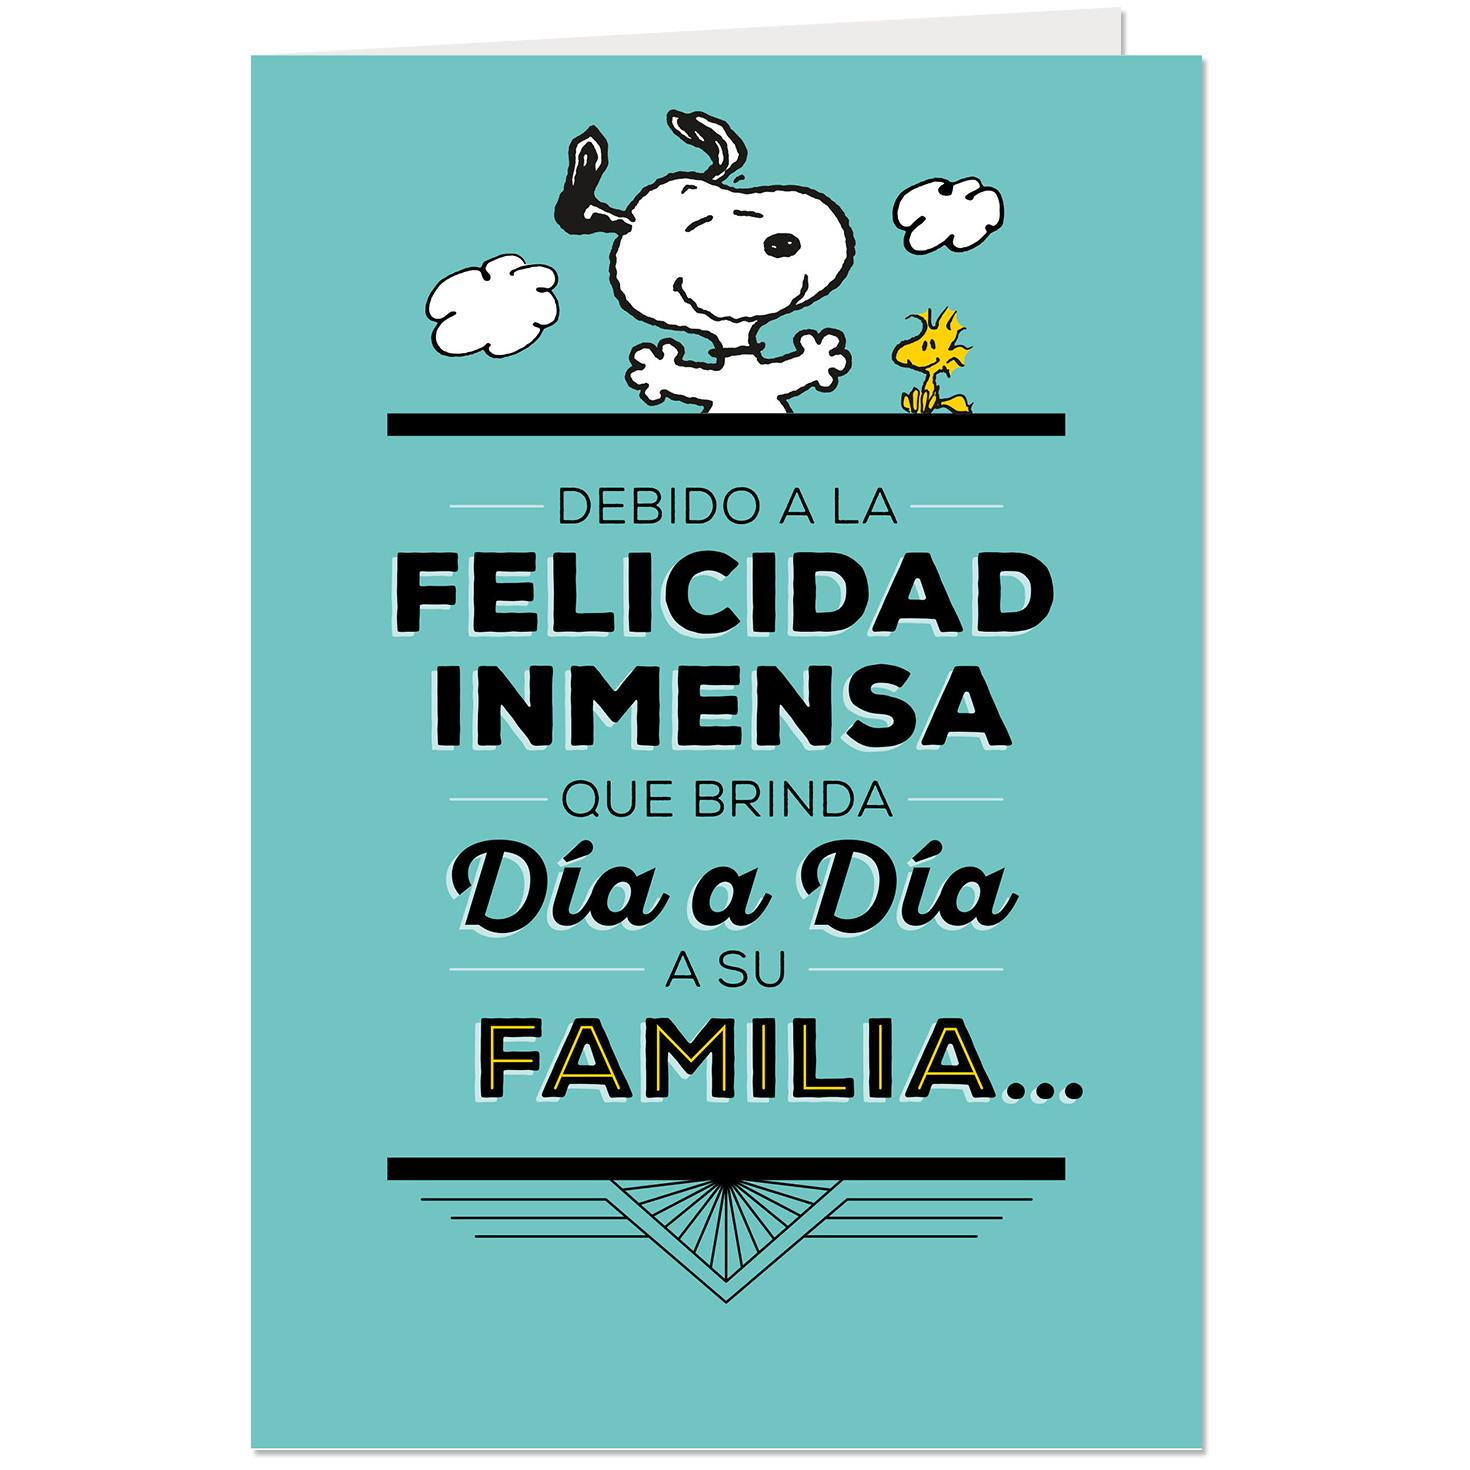 Peanuts best dad in the world certificate spanish language fathers peanuts best dad in the world certificate spanish language fathers day card m4hsunfo